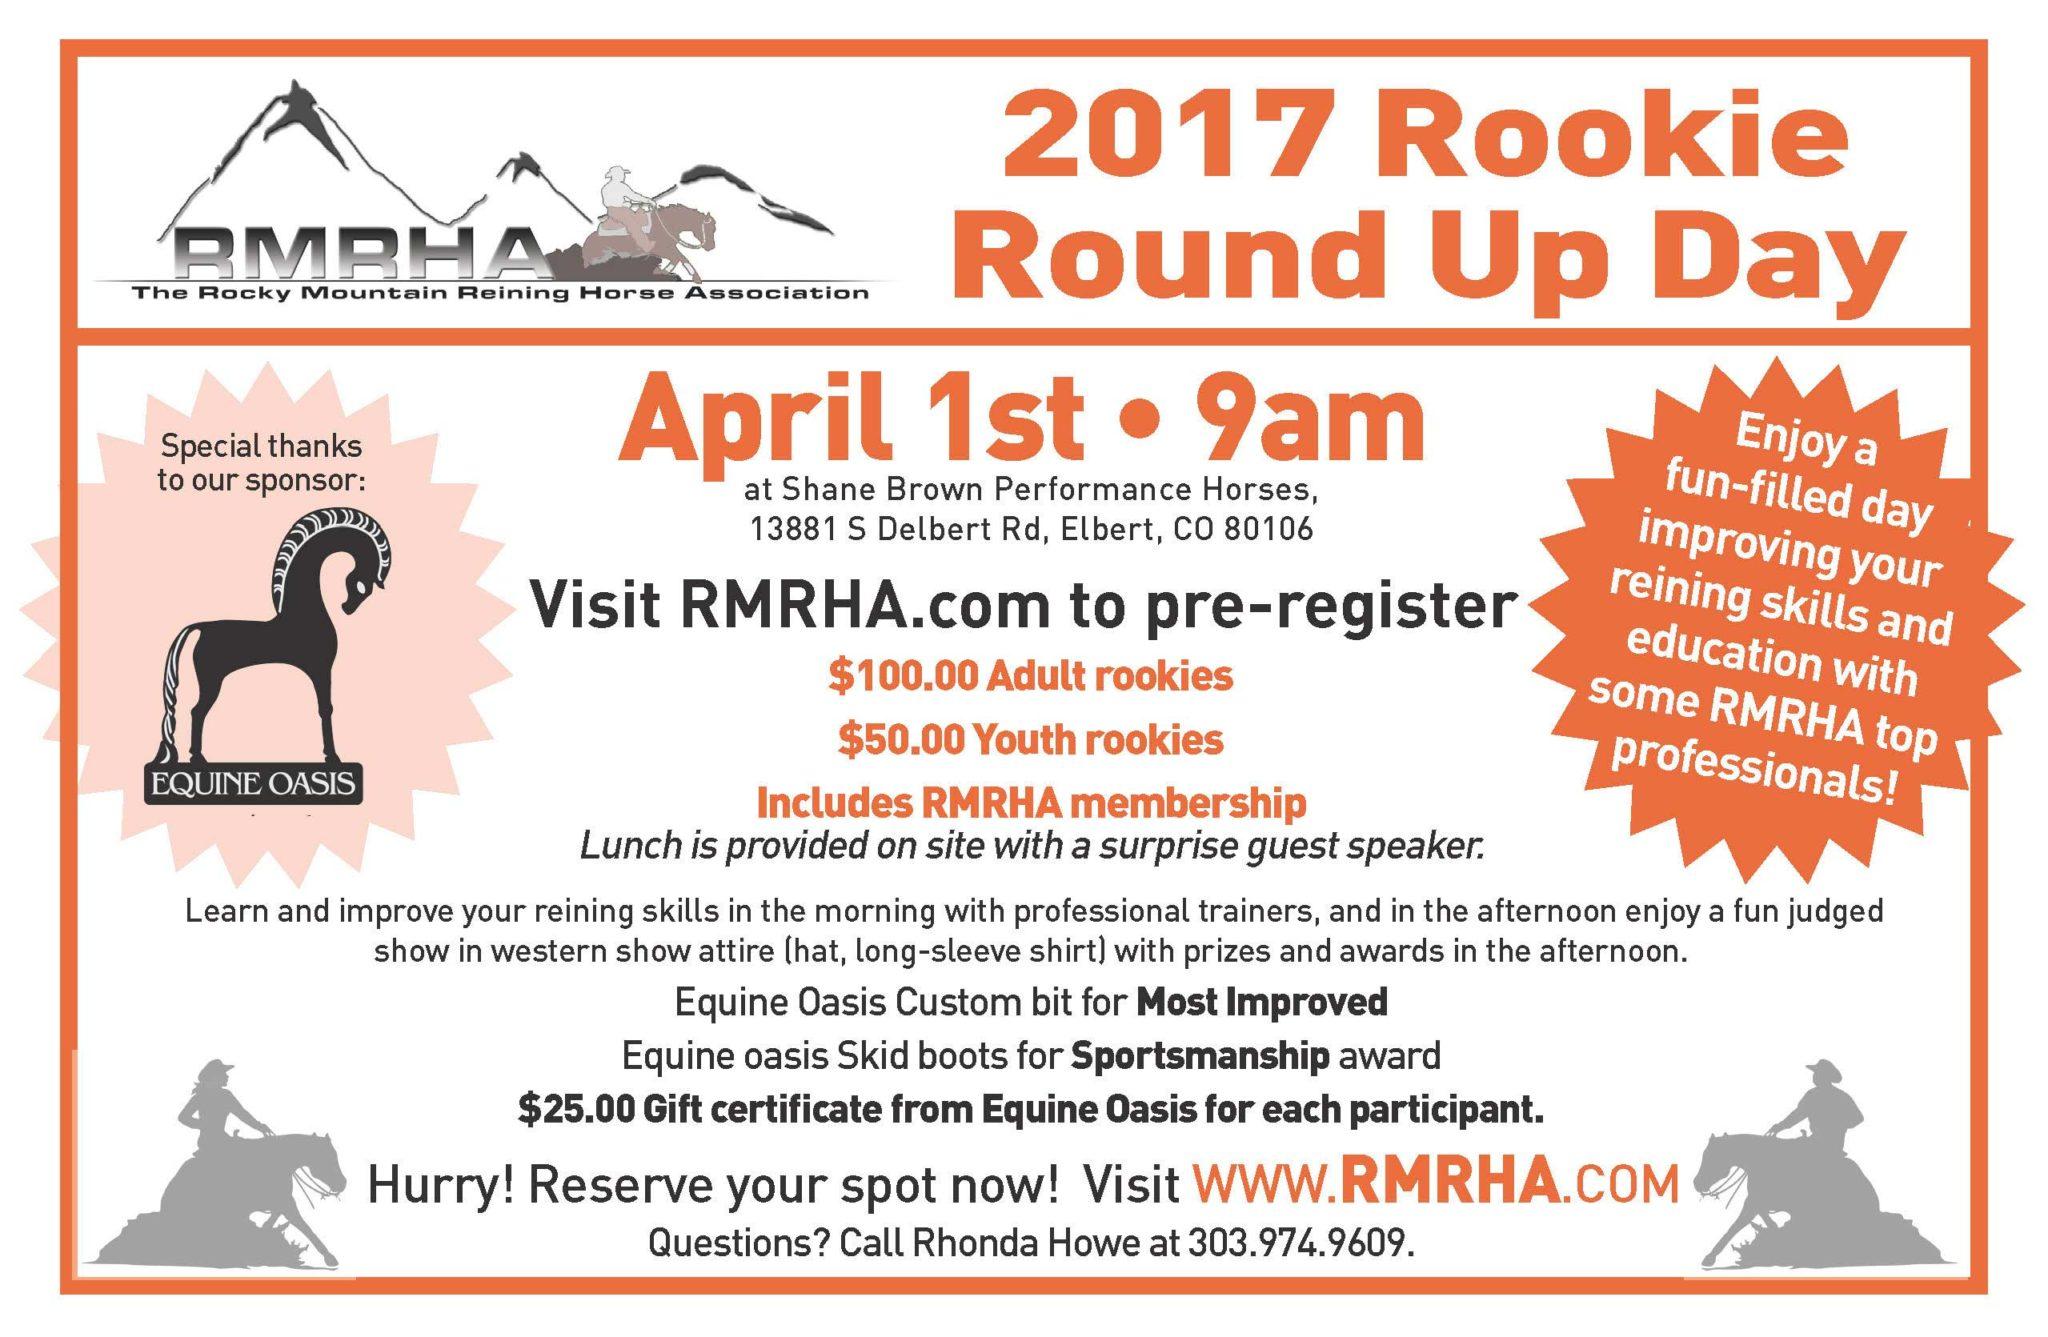 2017 RMRHA Rookie Roundup